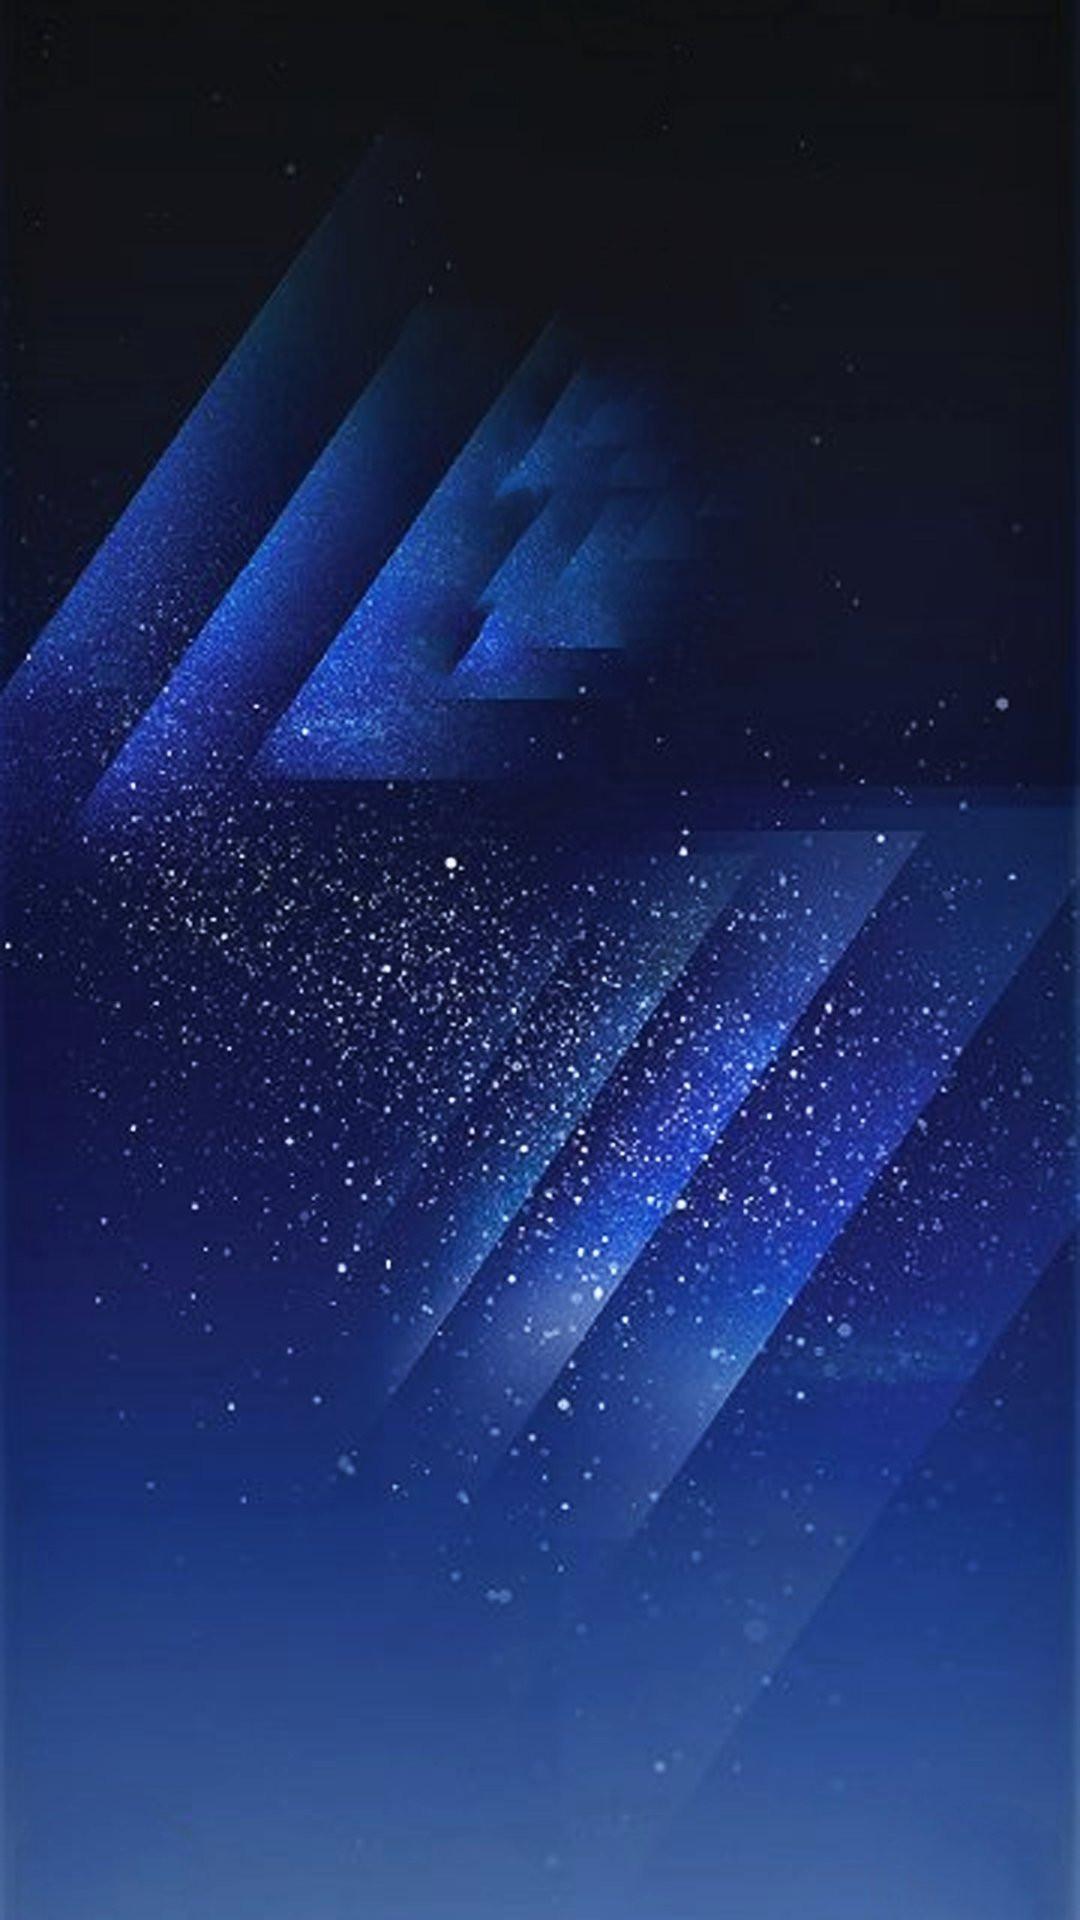 1489750258_galaxys8lockscreen.jpg